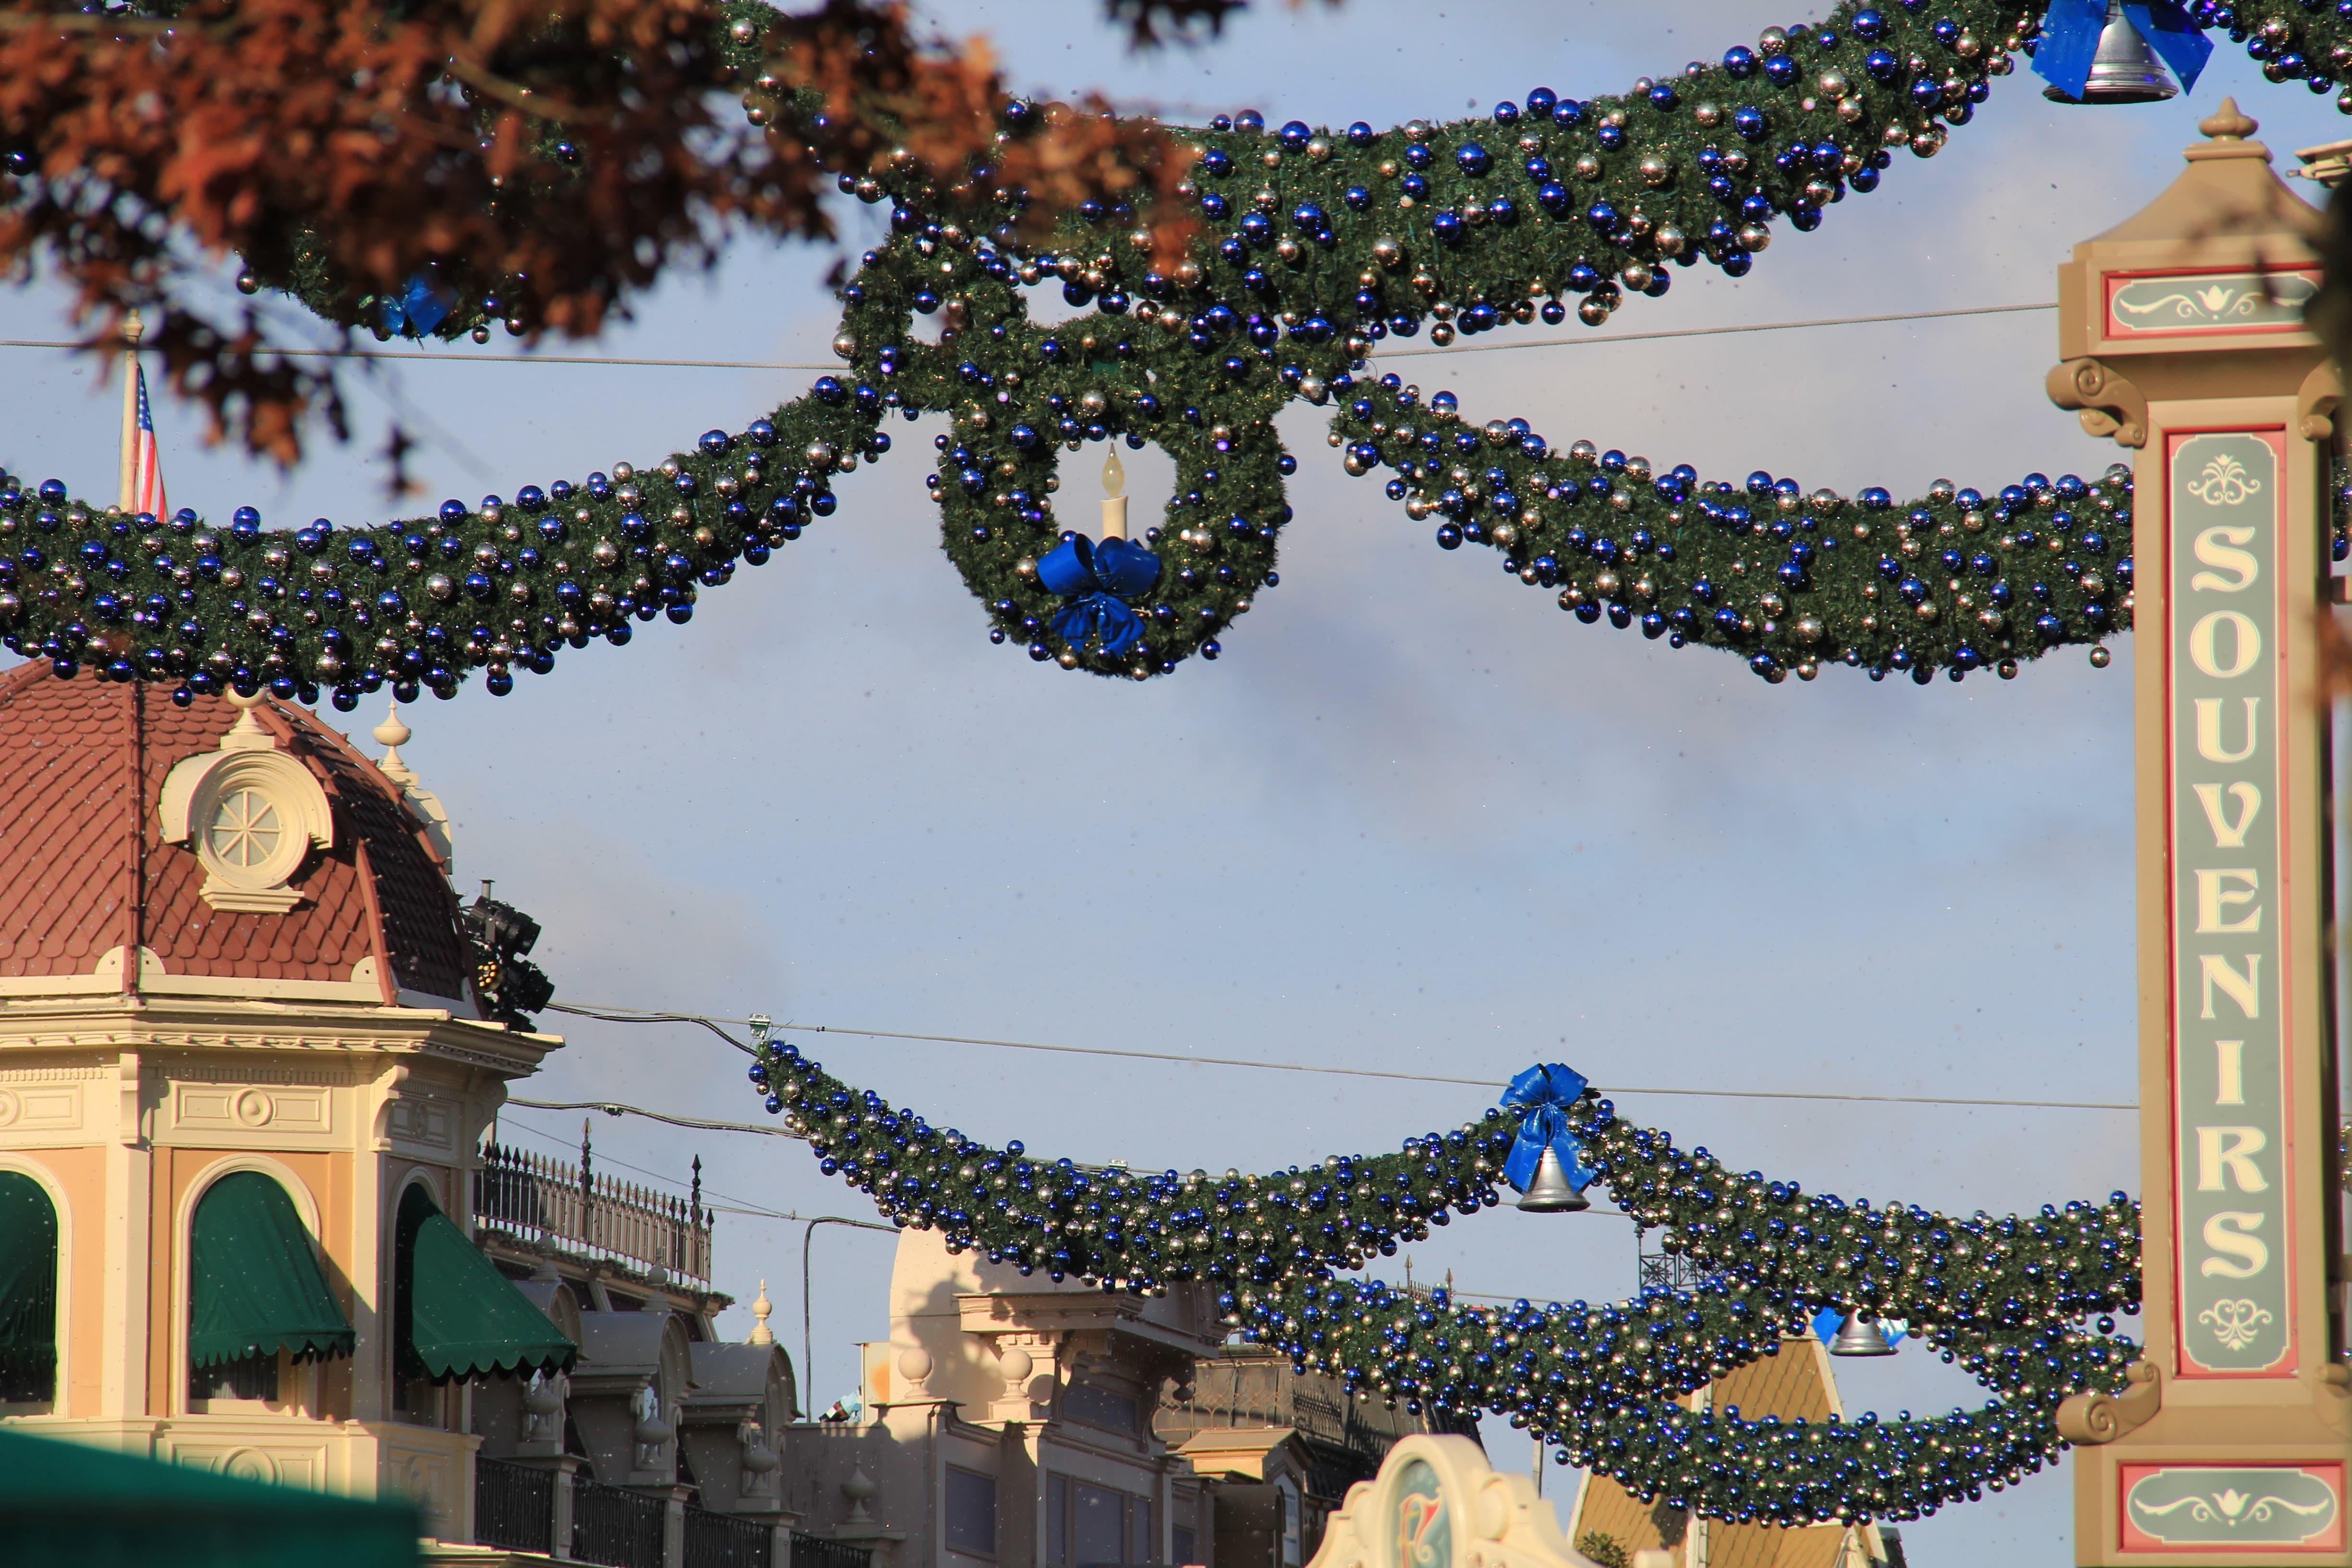 Disneyland Paris - Christmas 2017 - Decorations